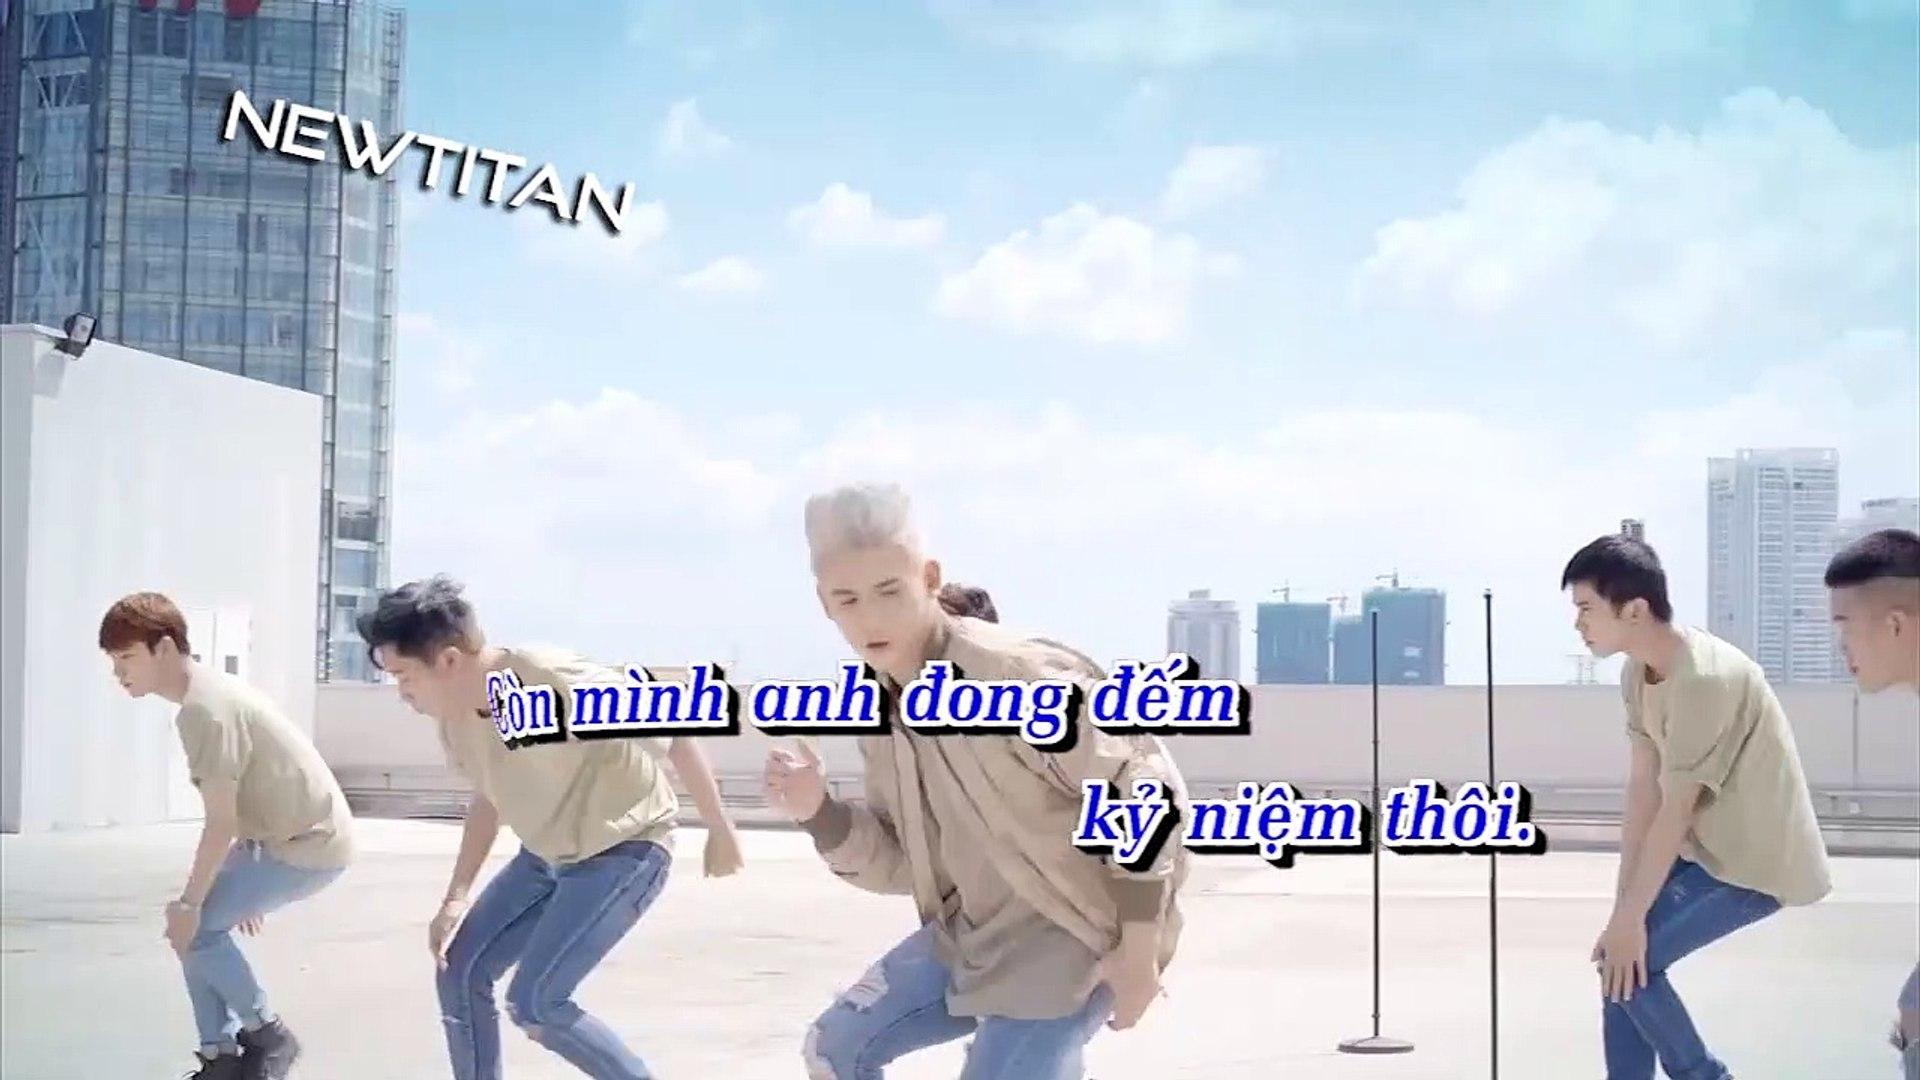 [Karaoke] Muộn - Đại Nhân [Beat]